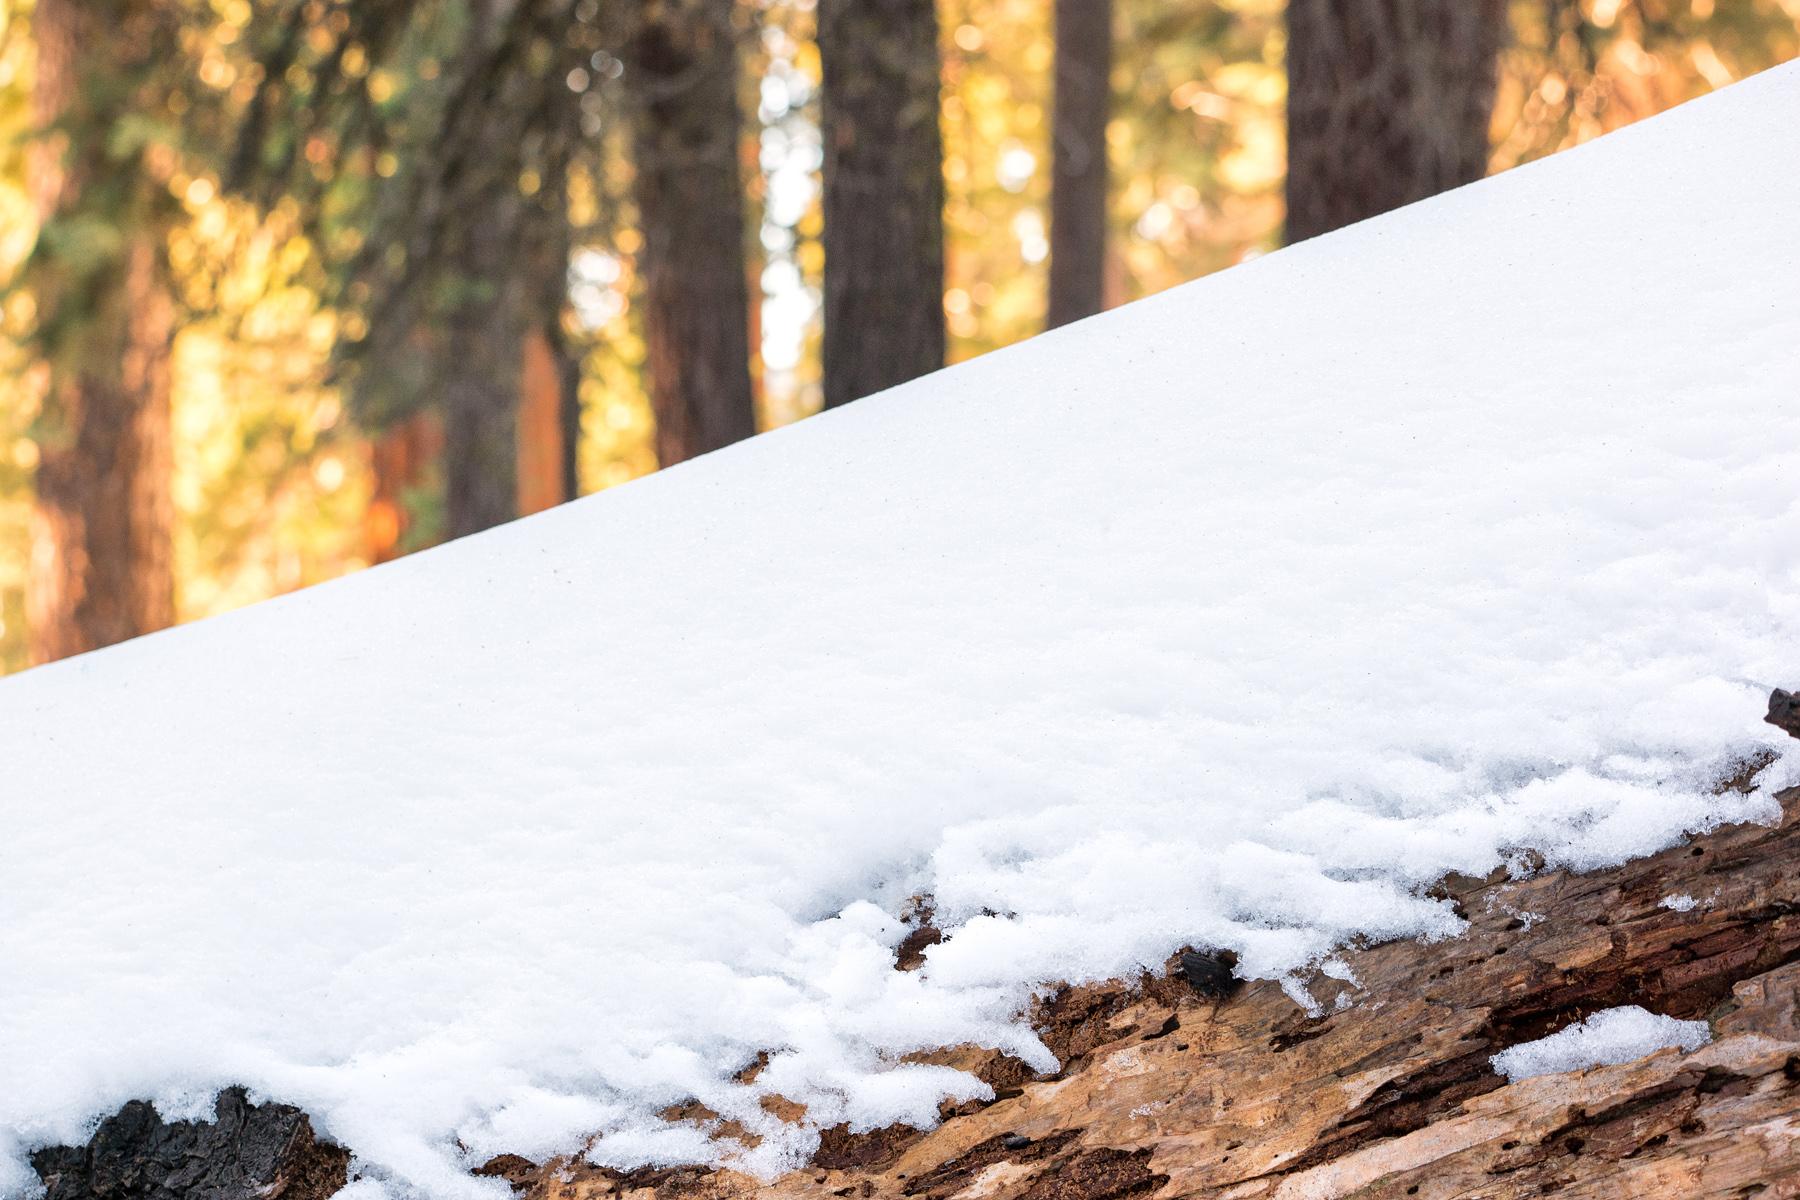 Wasim Muklashy Photography_Sequoia National Park_California_December 2015_-SAM_4127-Edit.jpg